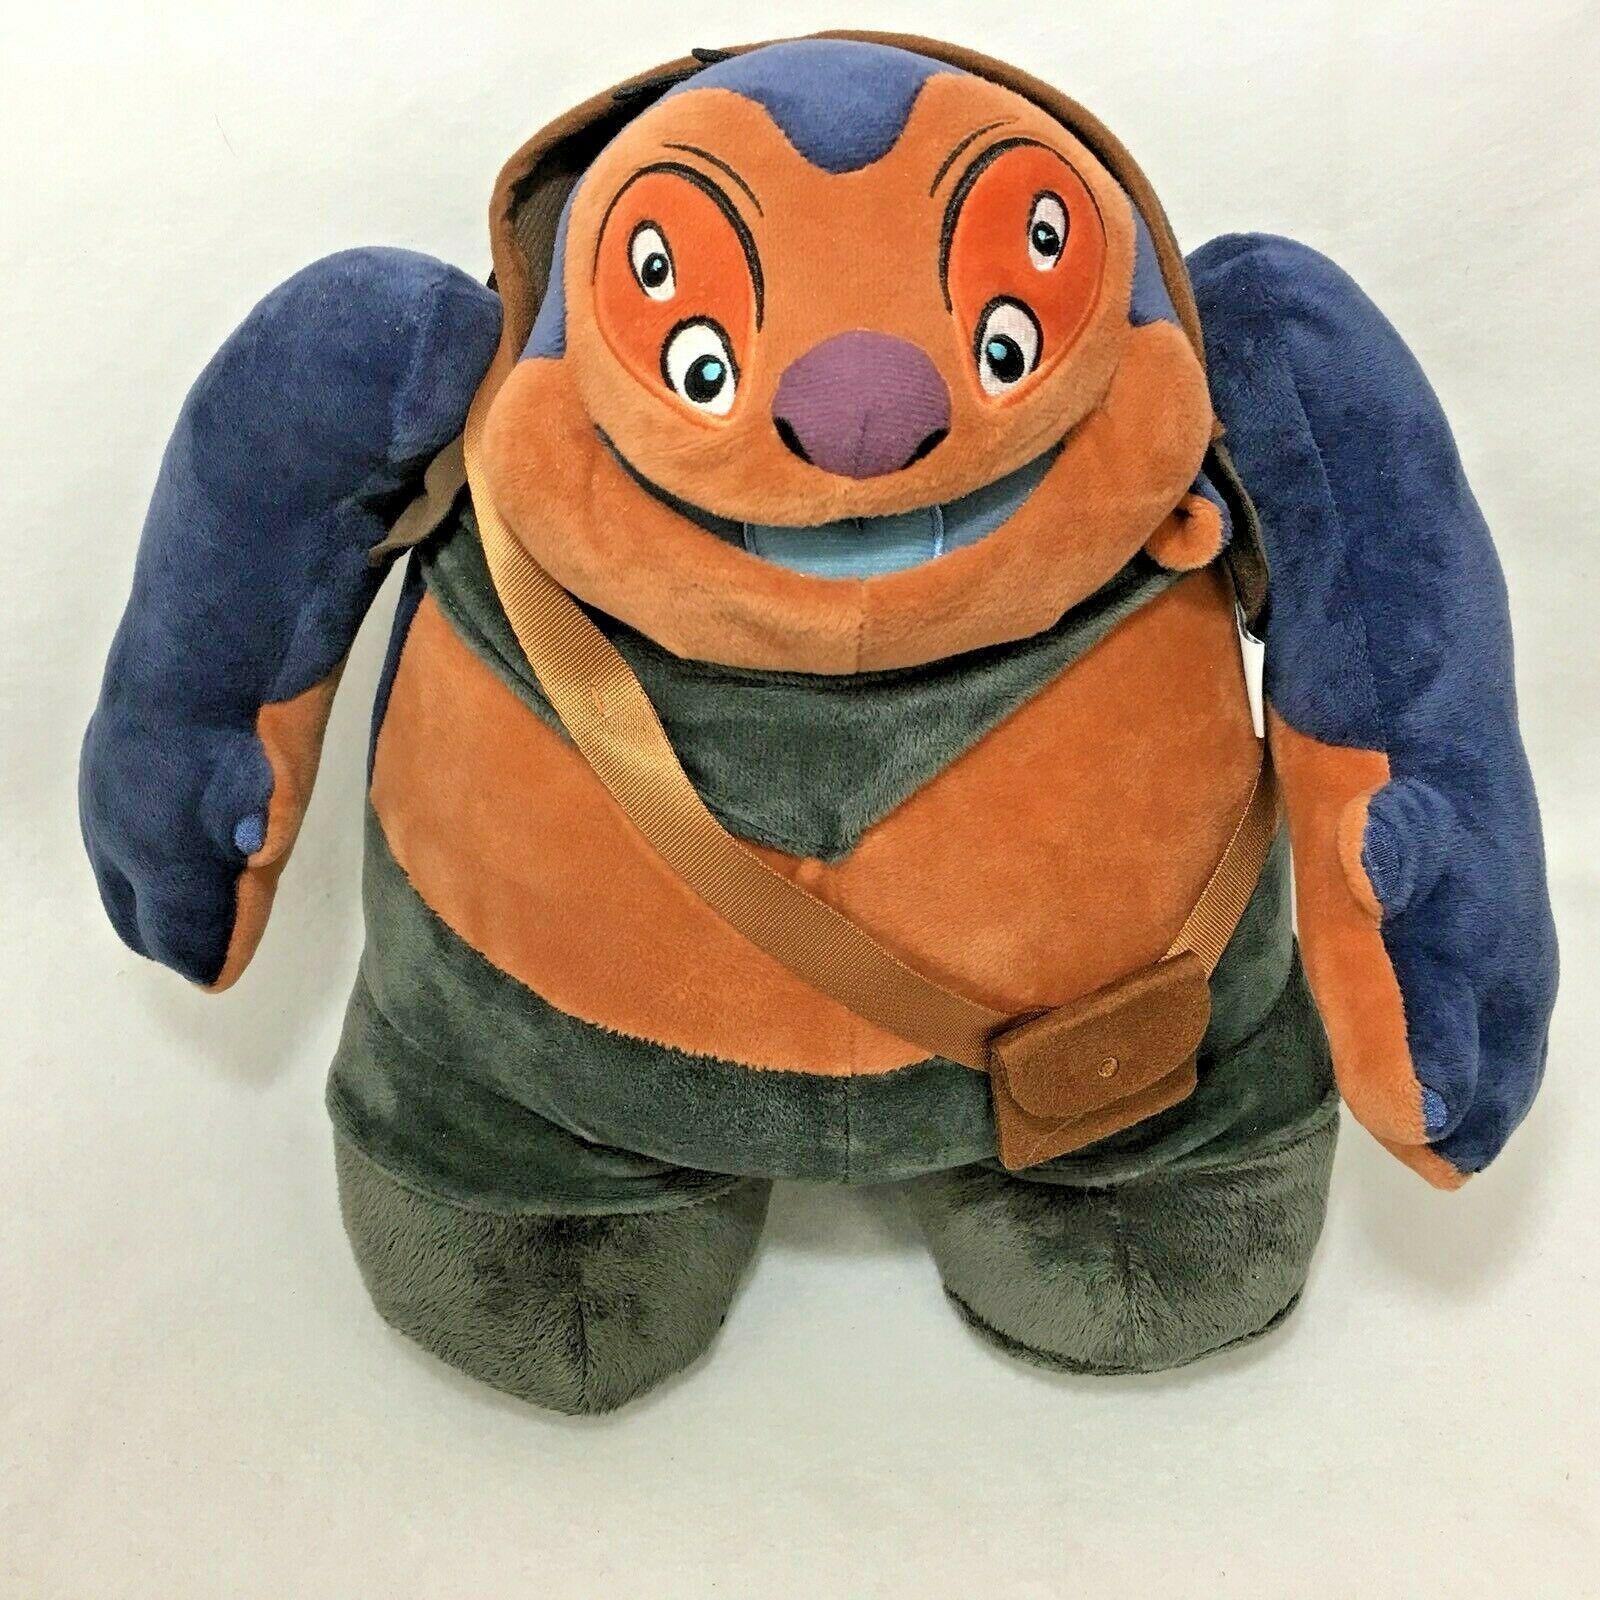 Disney Store Dr Jumba Jookiba Plush From Lilo & Stitch 13 Inch Mad Scientist